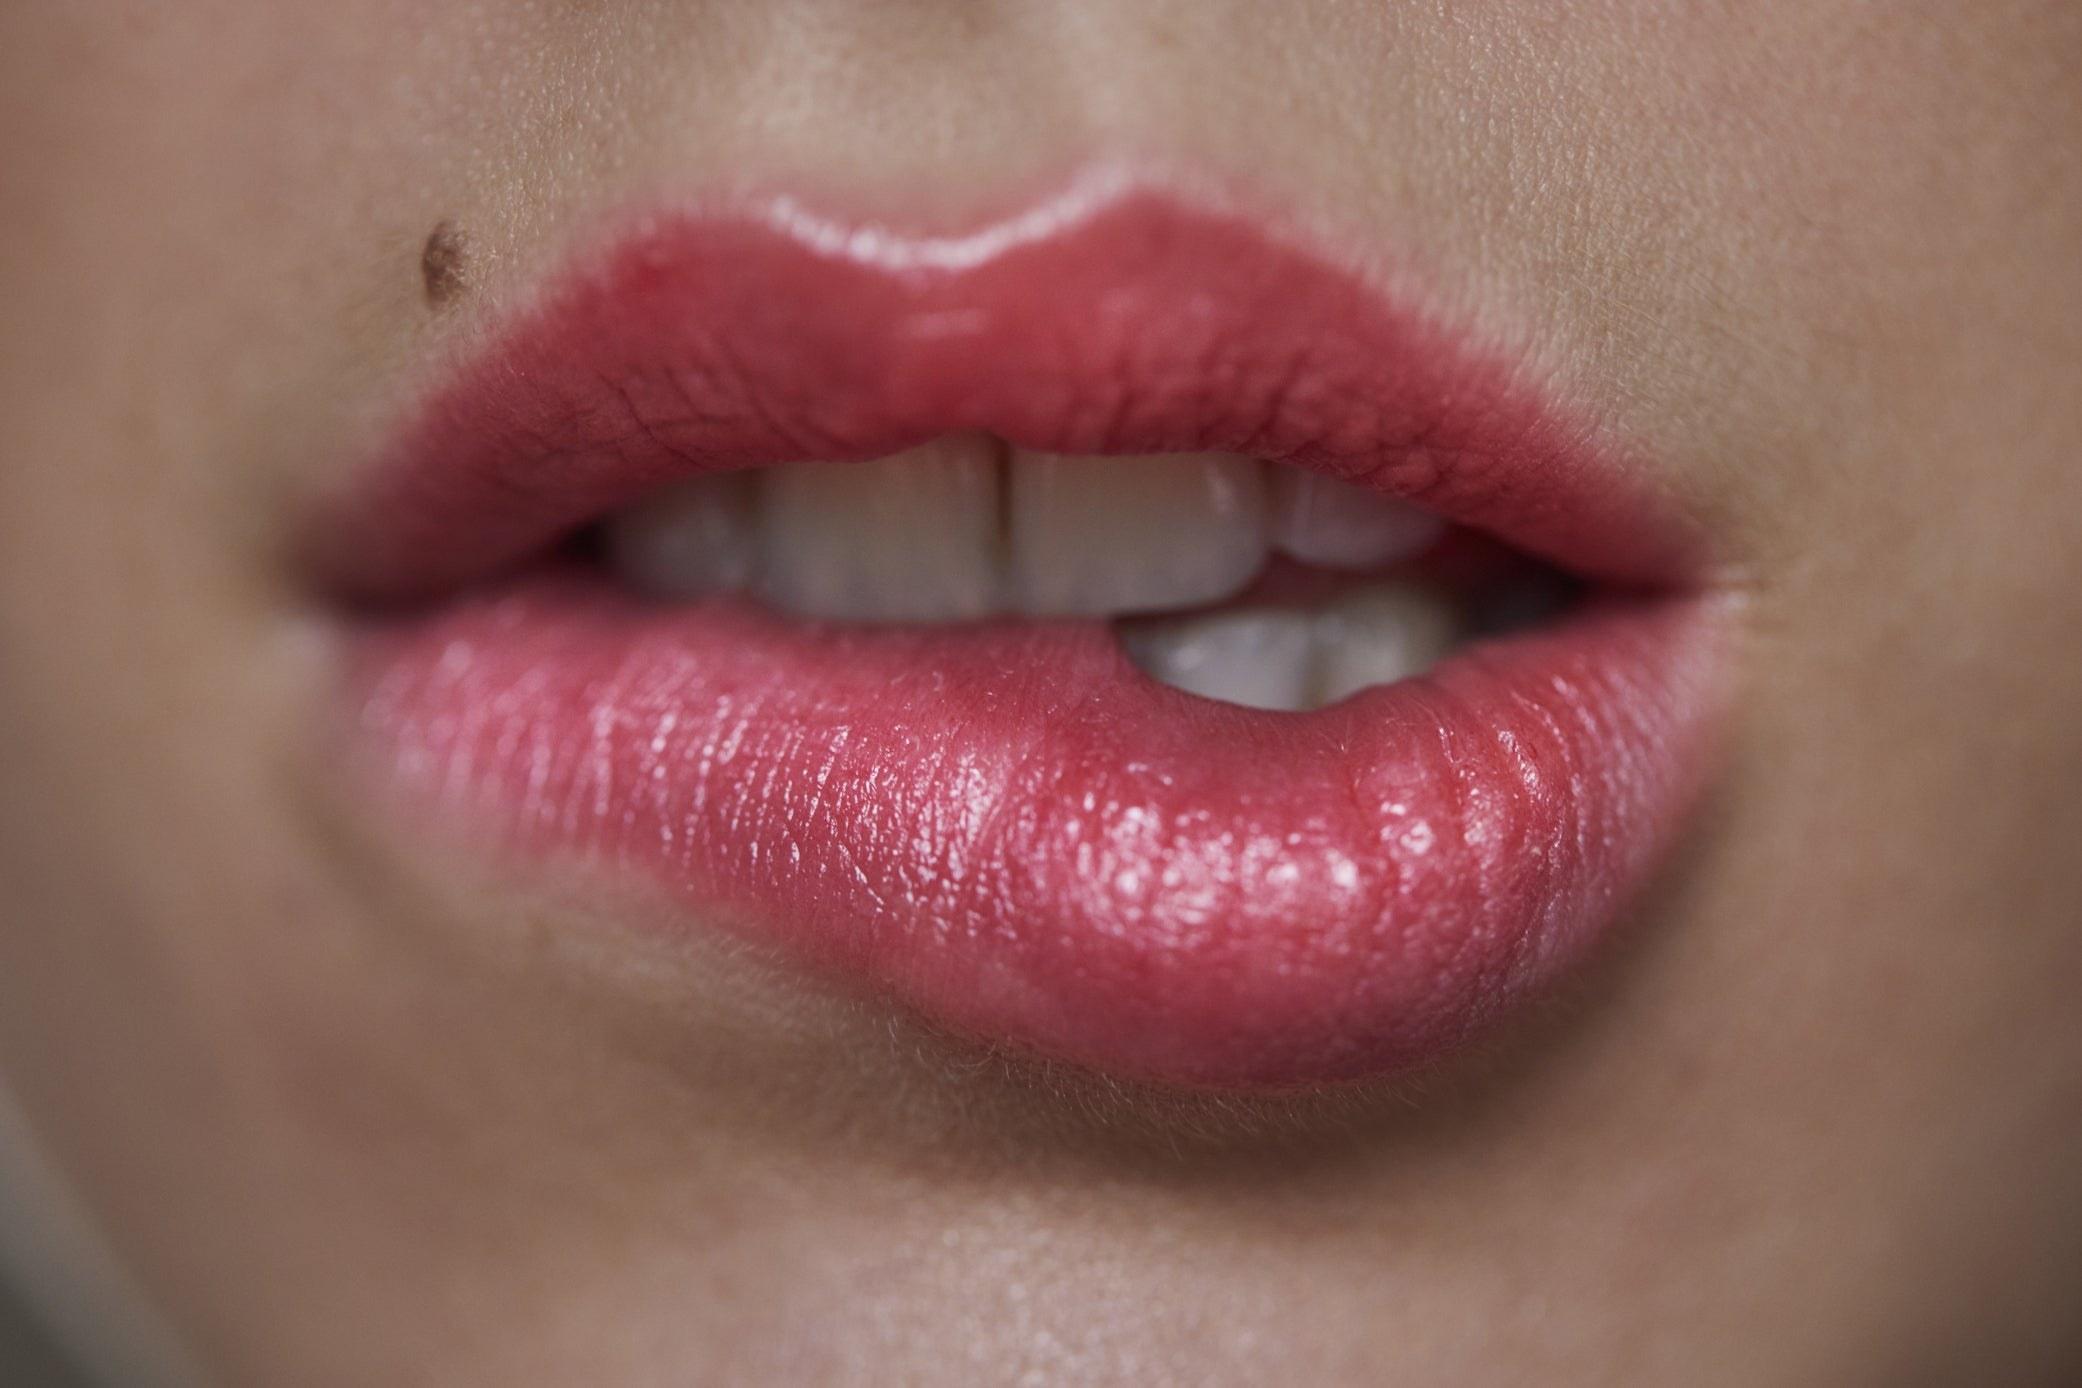 Someone biting their lip